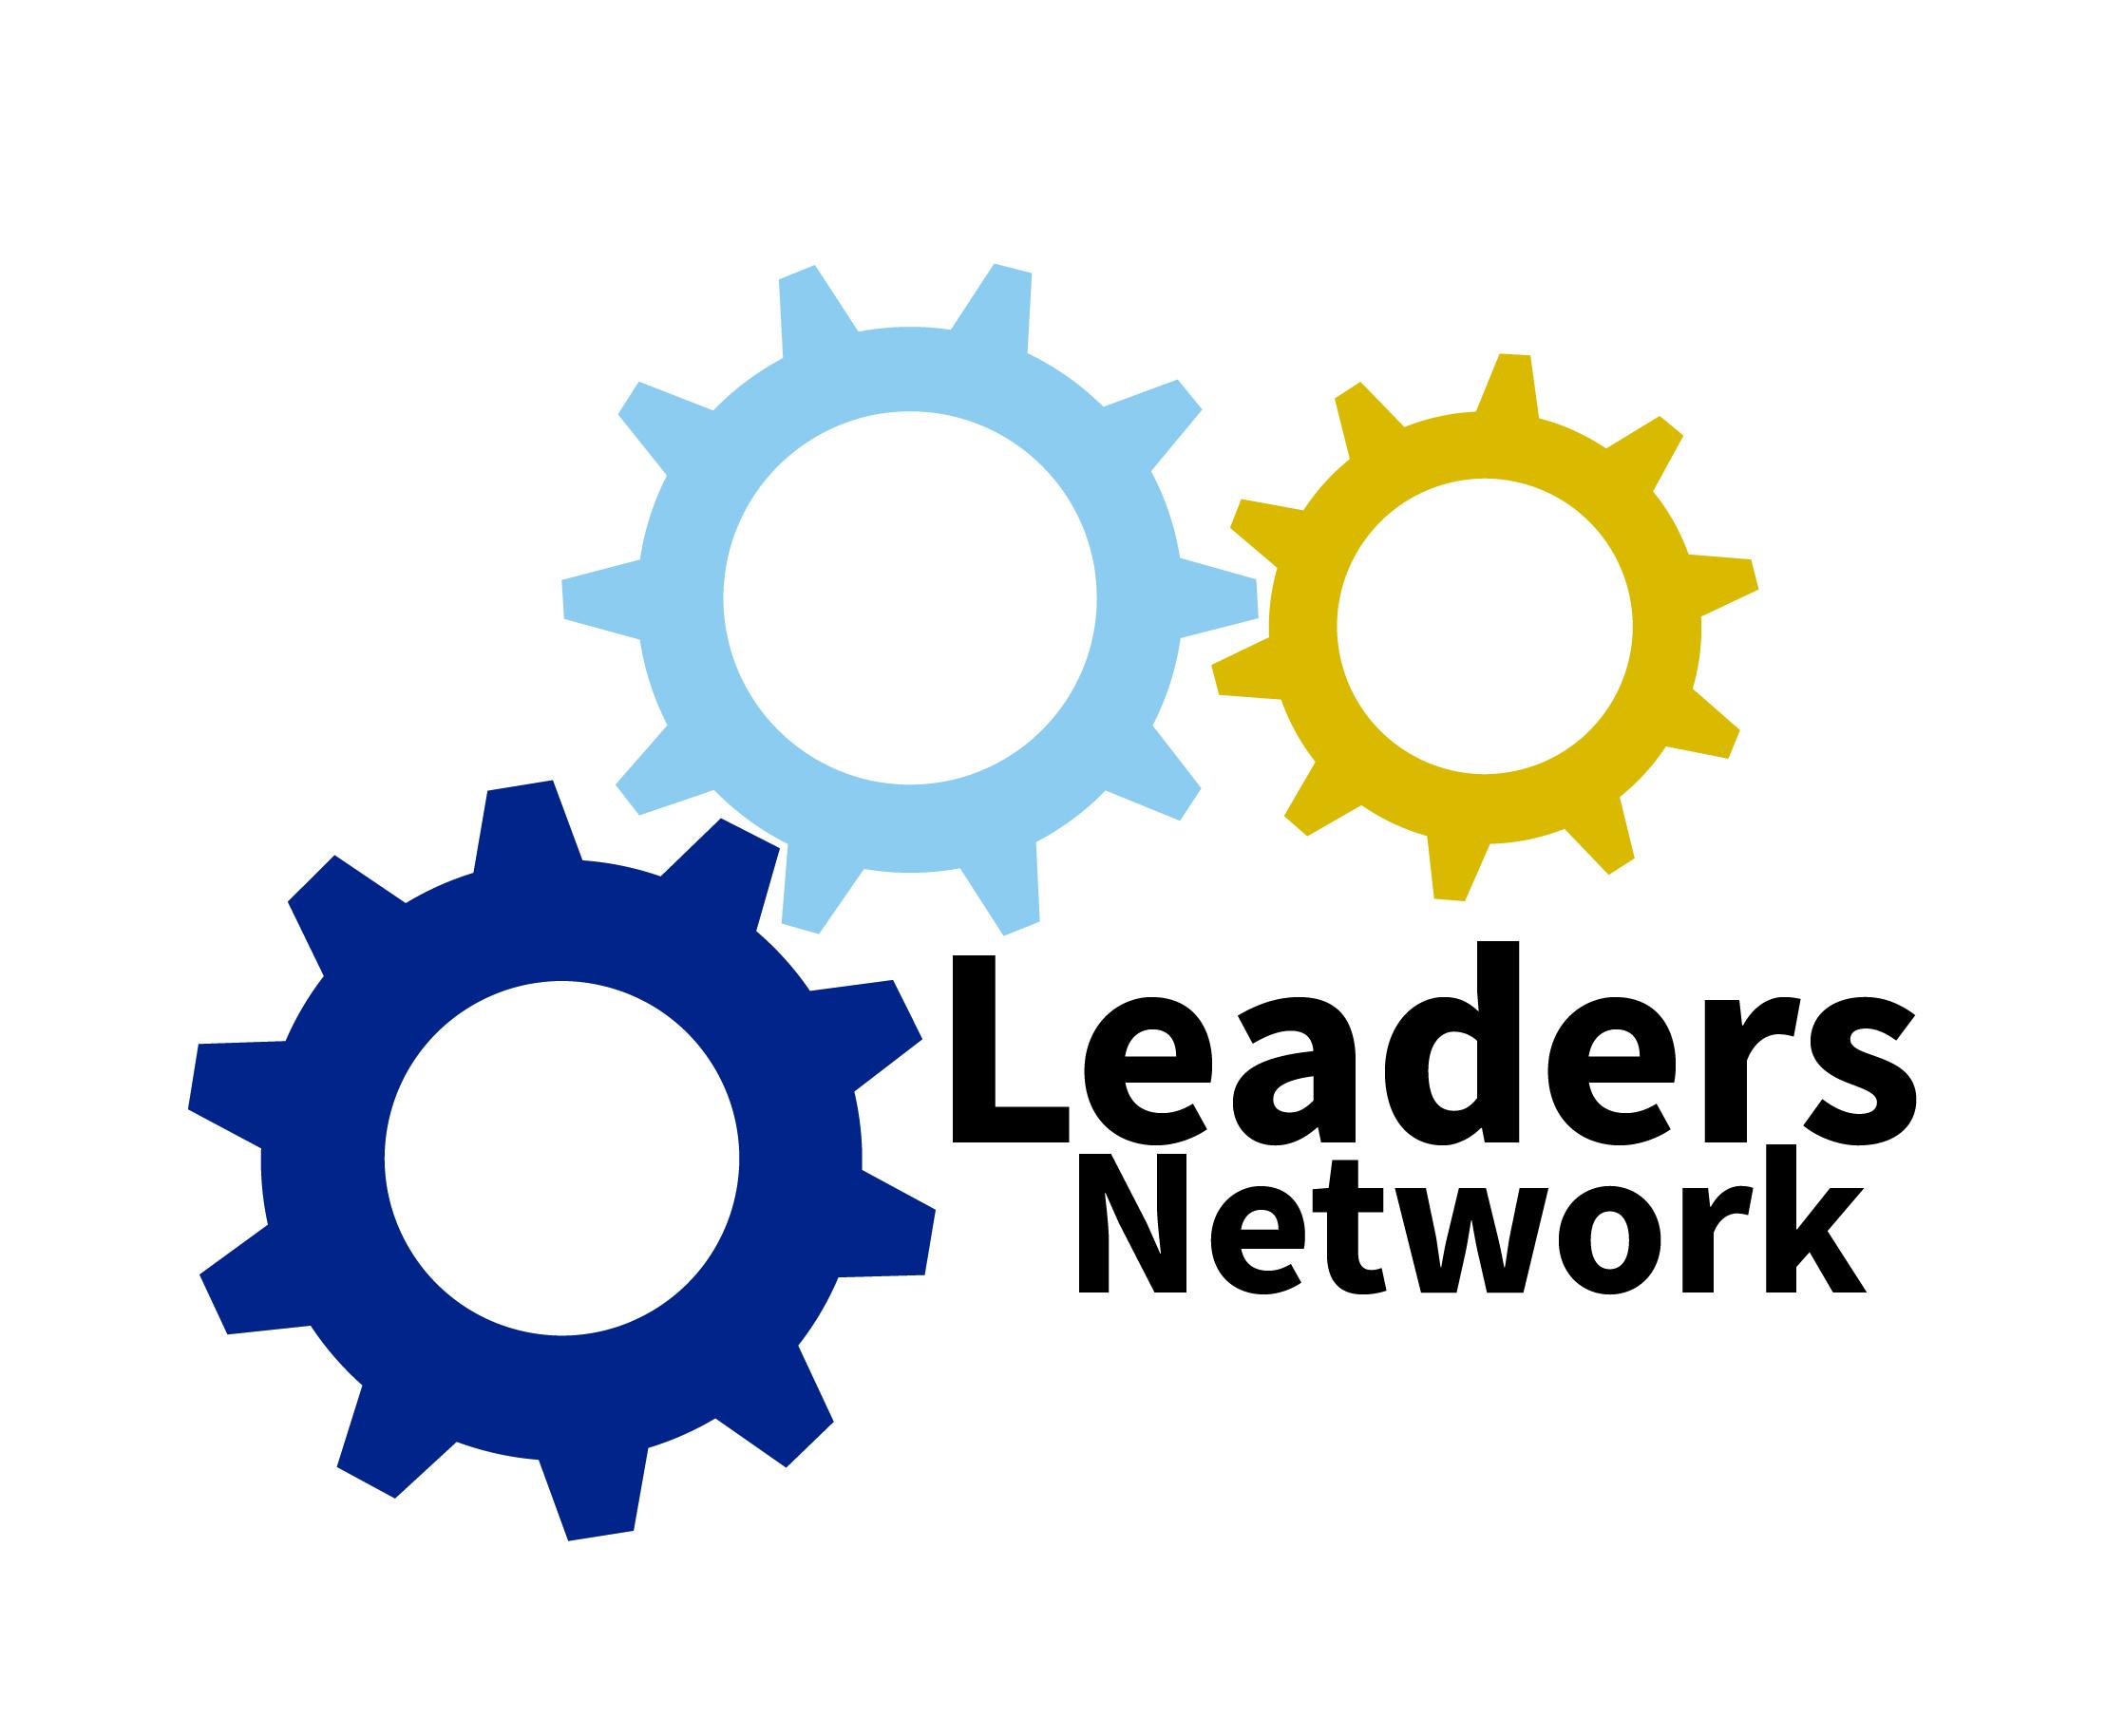 21st Century Learning - Leaders Network-01.jpg